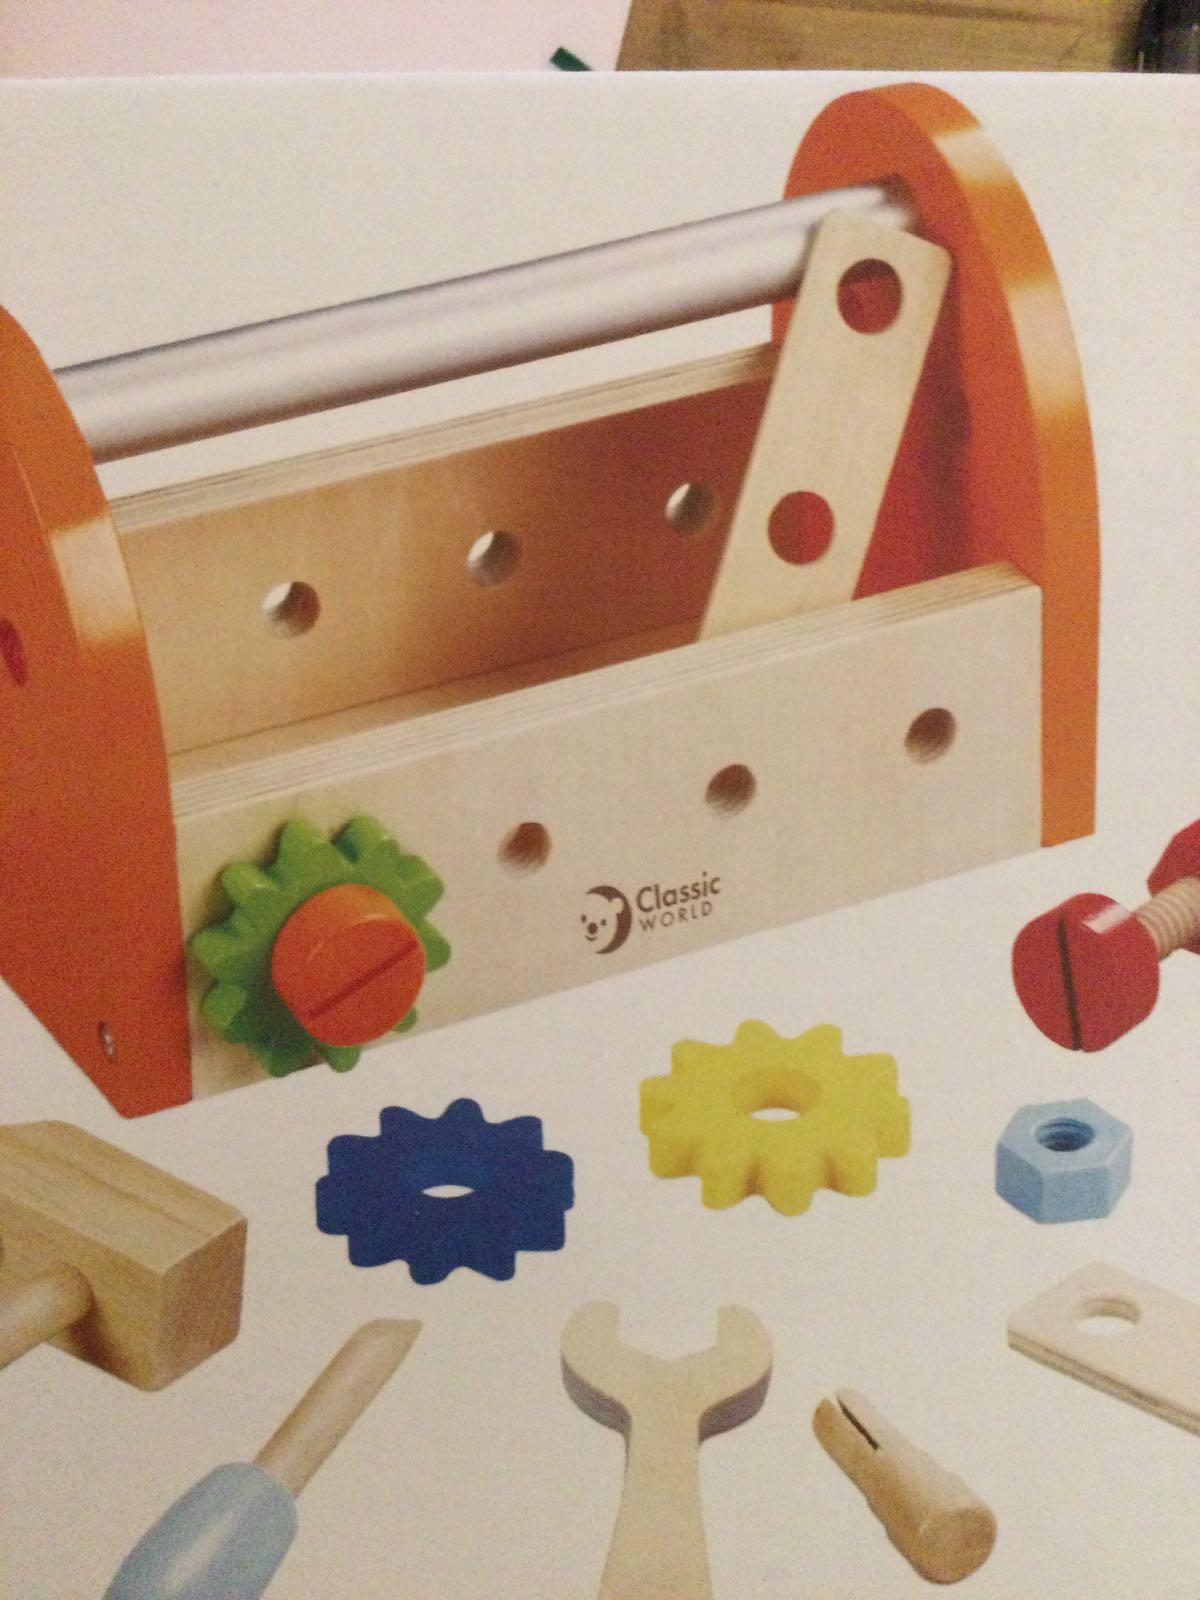 Classic World - Carpenter Tool Box